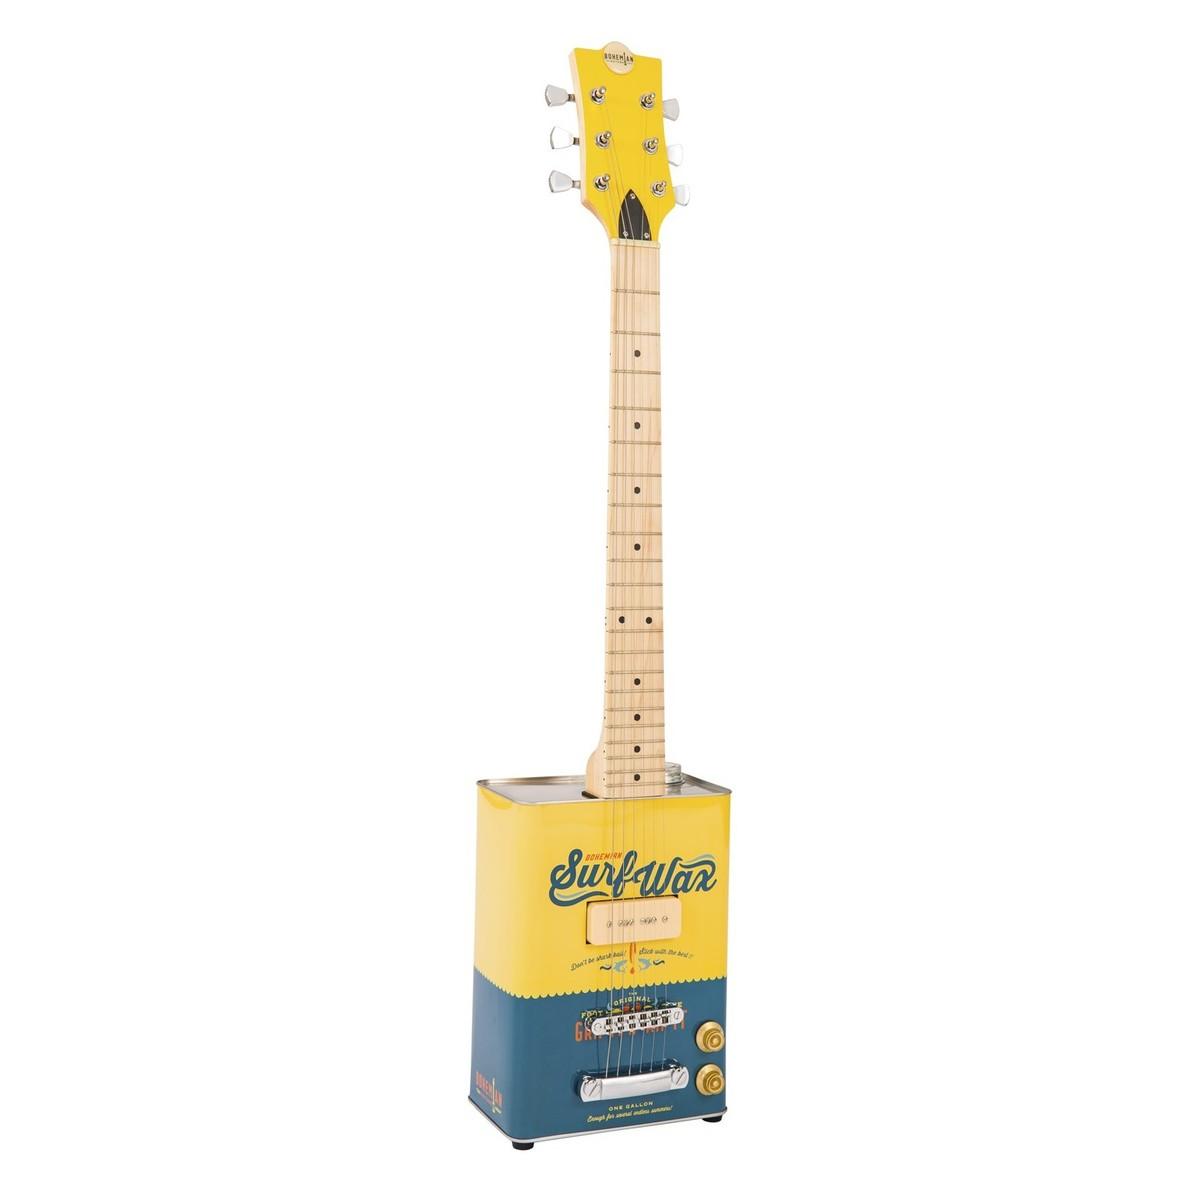 Overstyrt Elektrisk Gitarlyd. Overdriven Electric Guitar